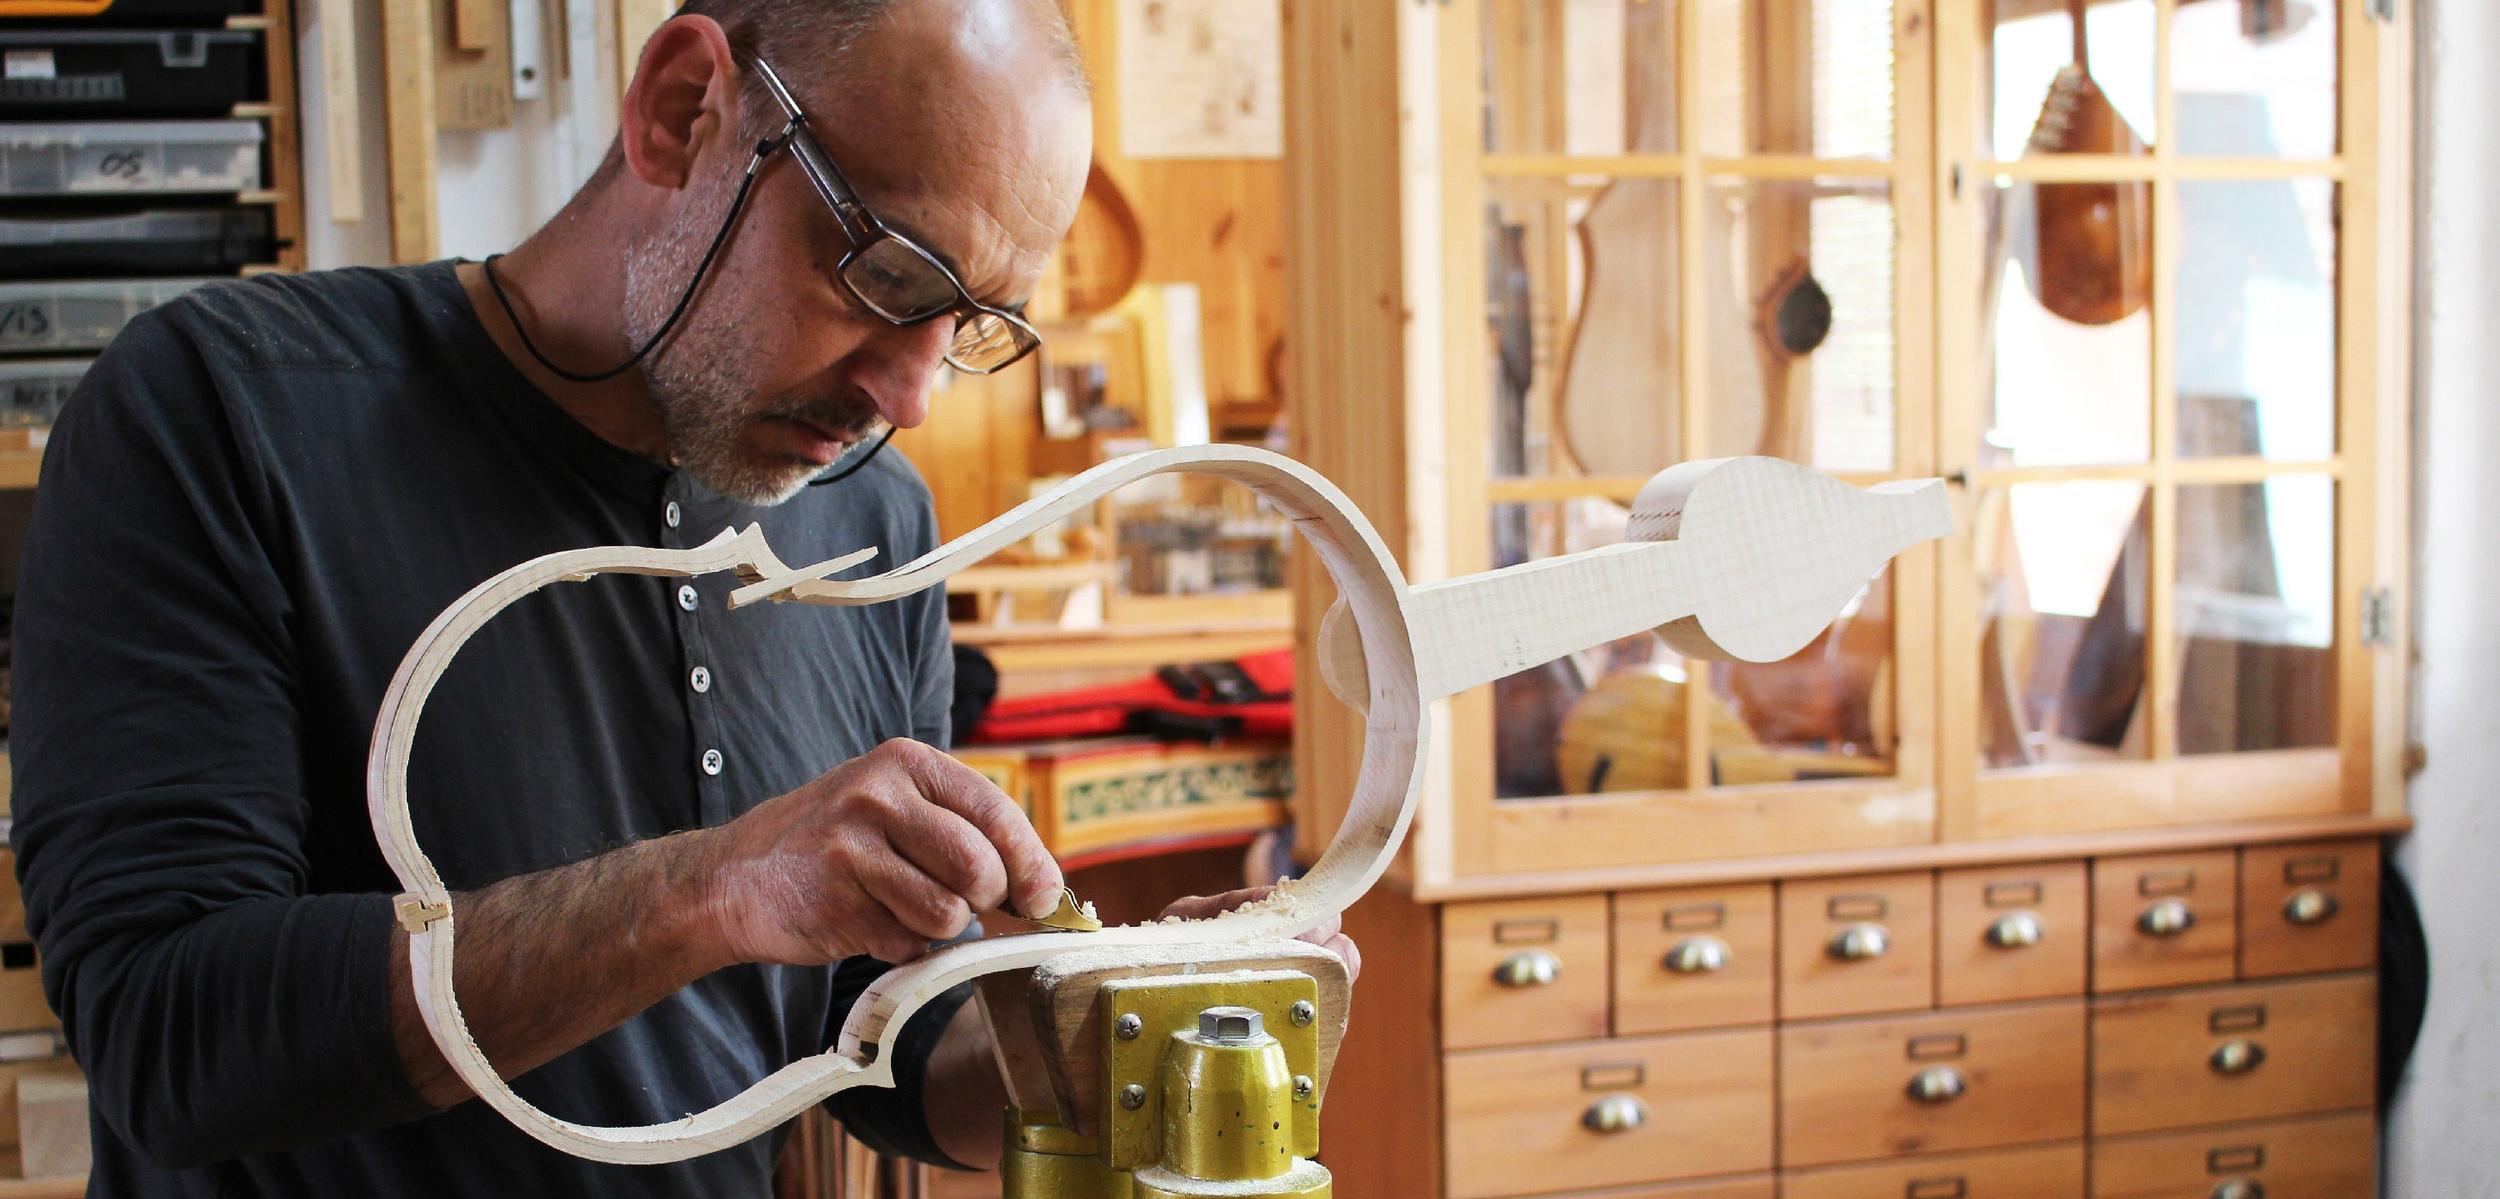 L'artigianu - L'artisan